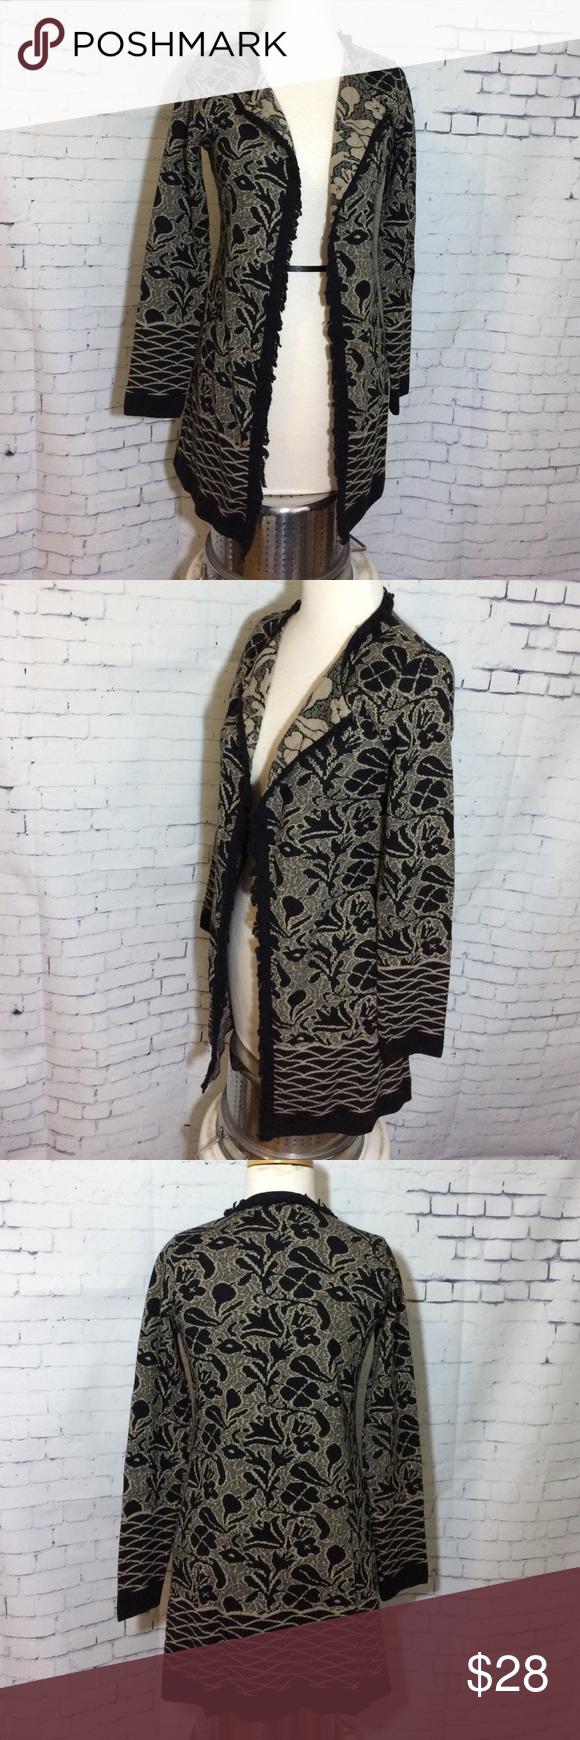 Gottardi Collection Black Beige Cardigan L | Merino wool, Wool ...